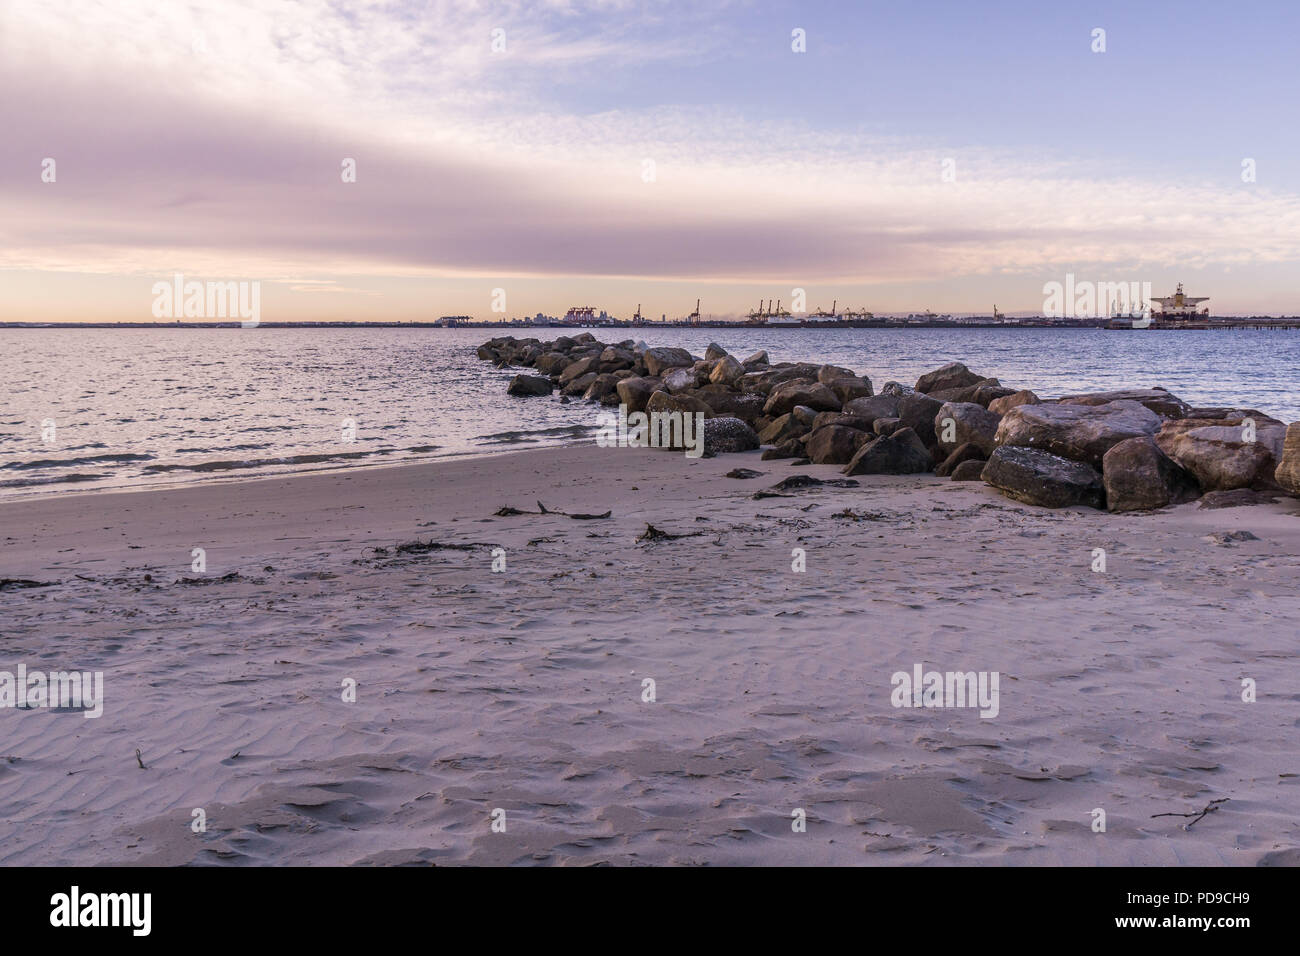 The beach at Kurnell, Sydney Stock Photo